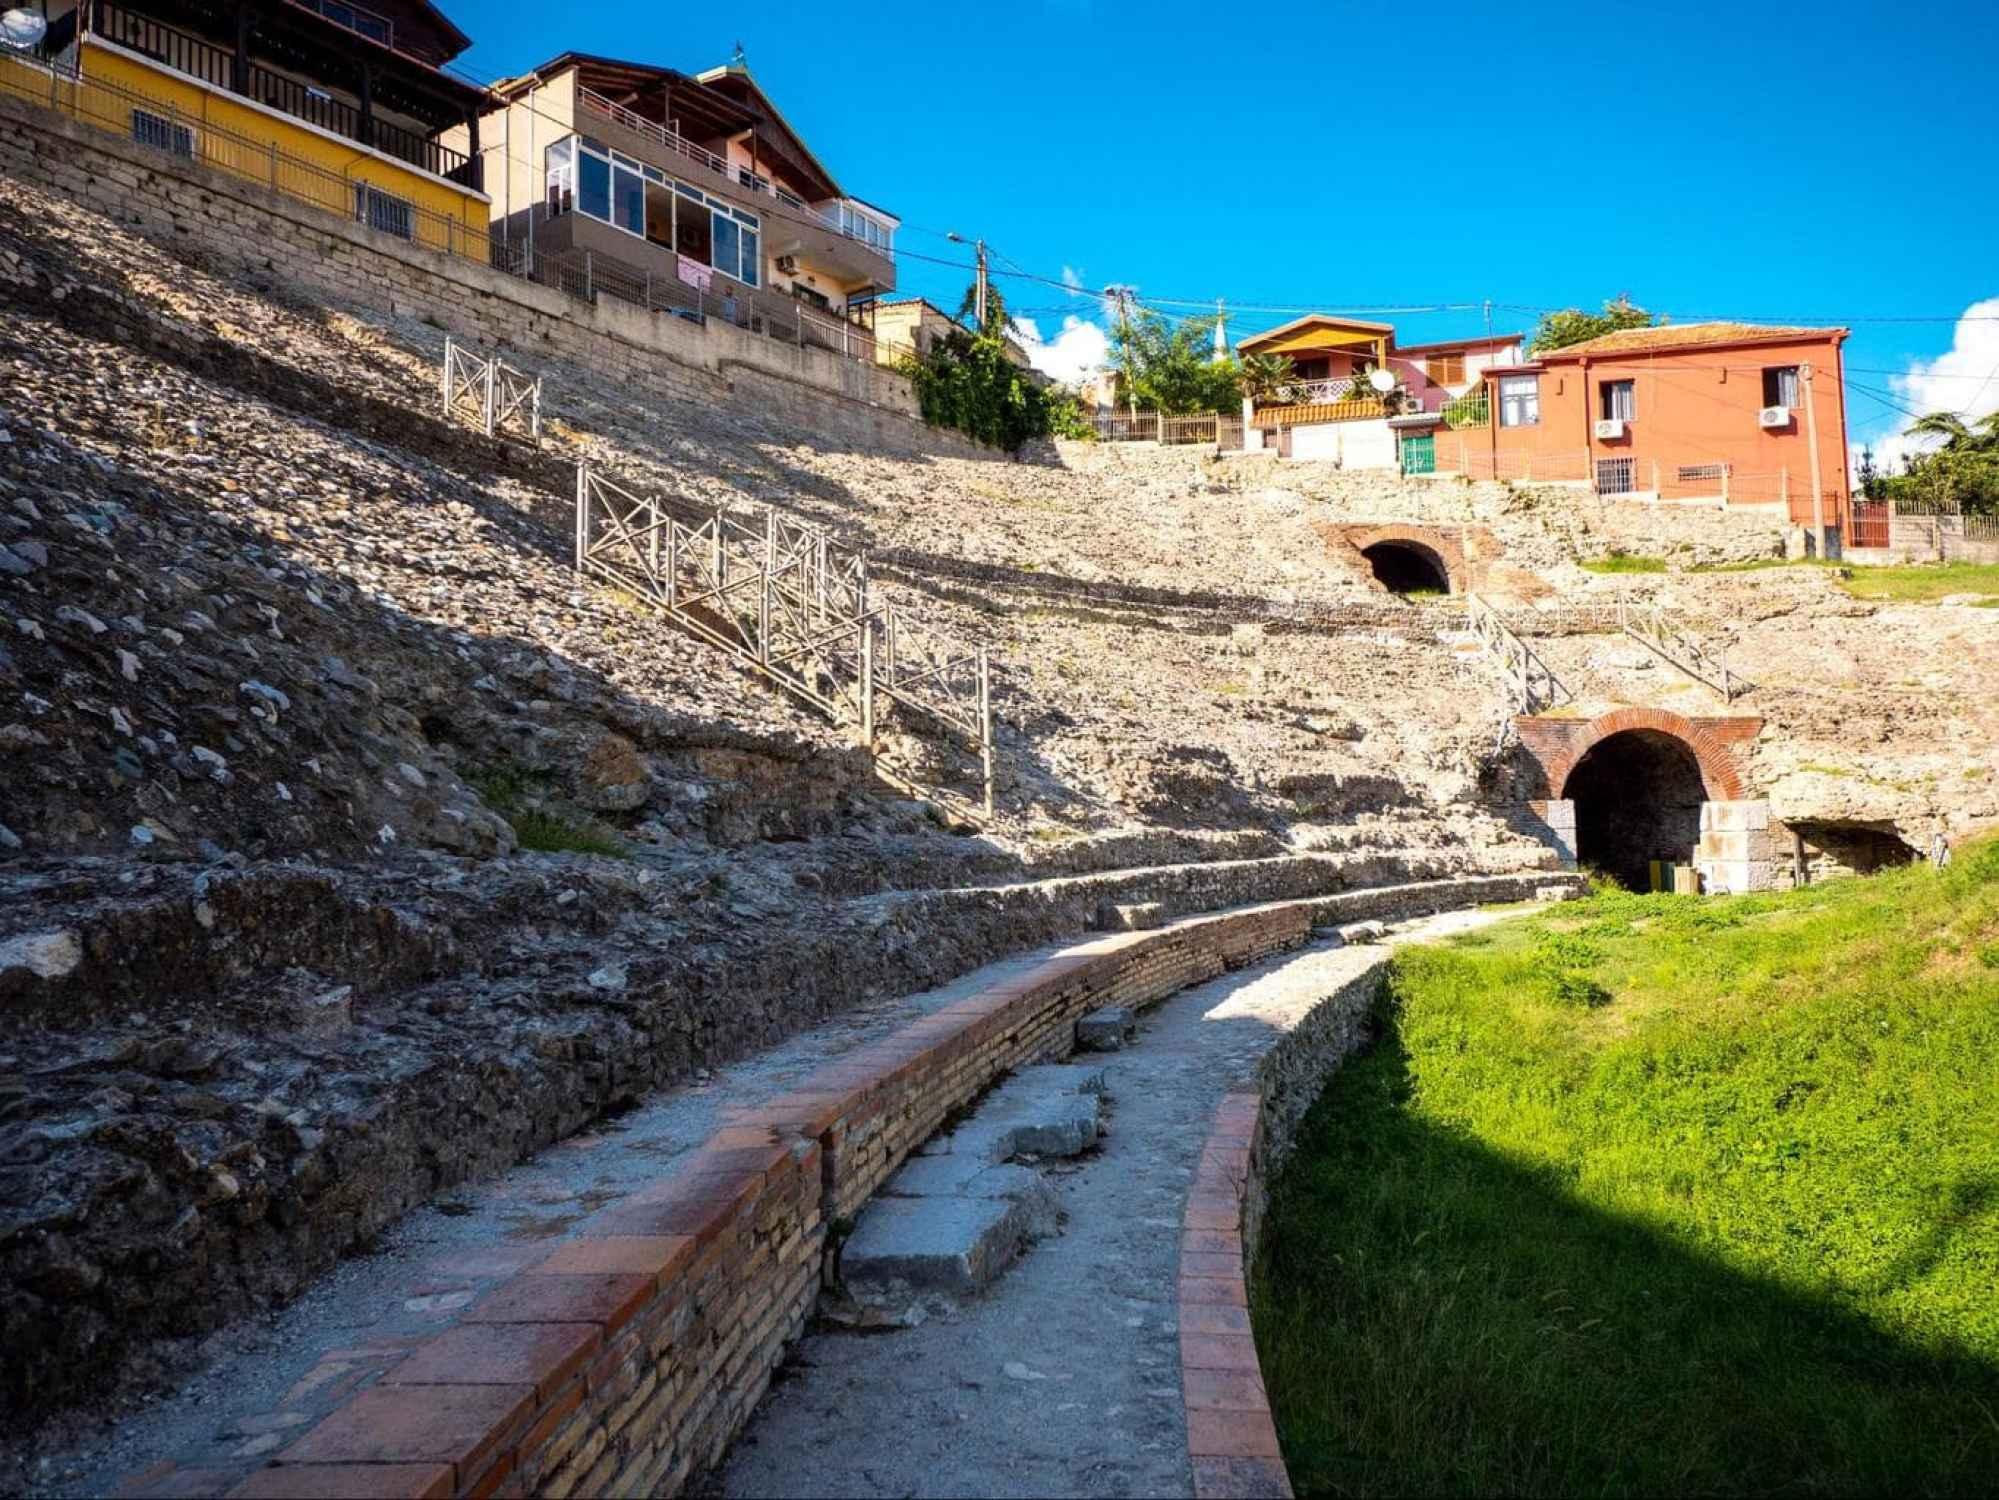 Roman Amphitheatre of Durres up close